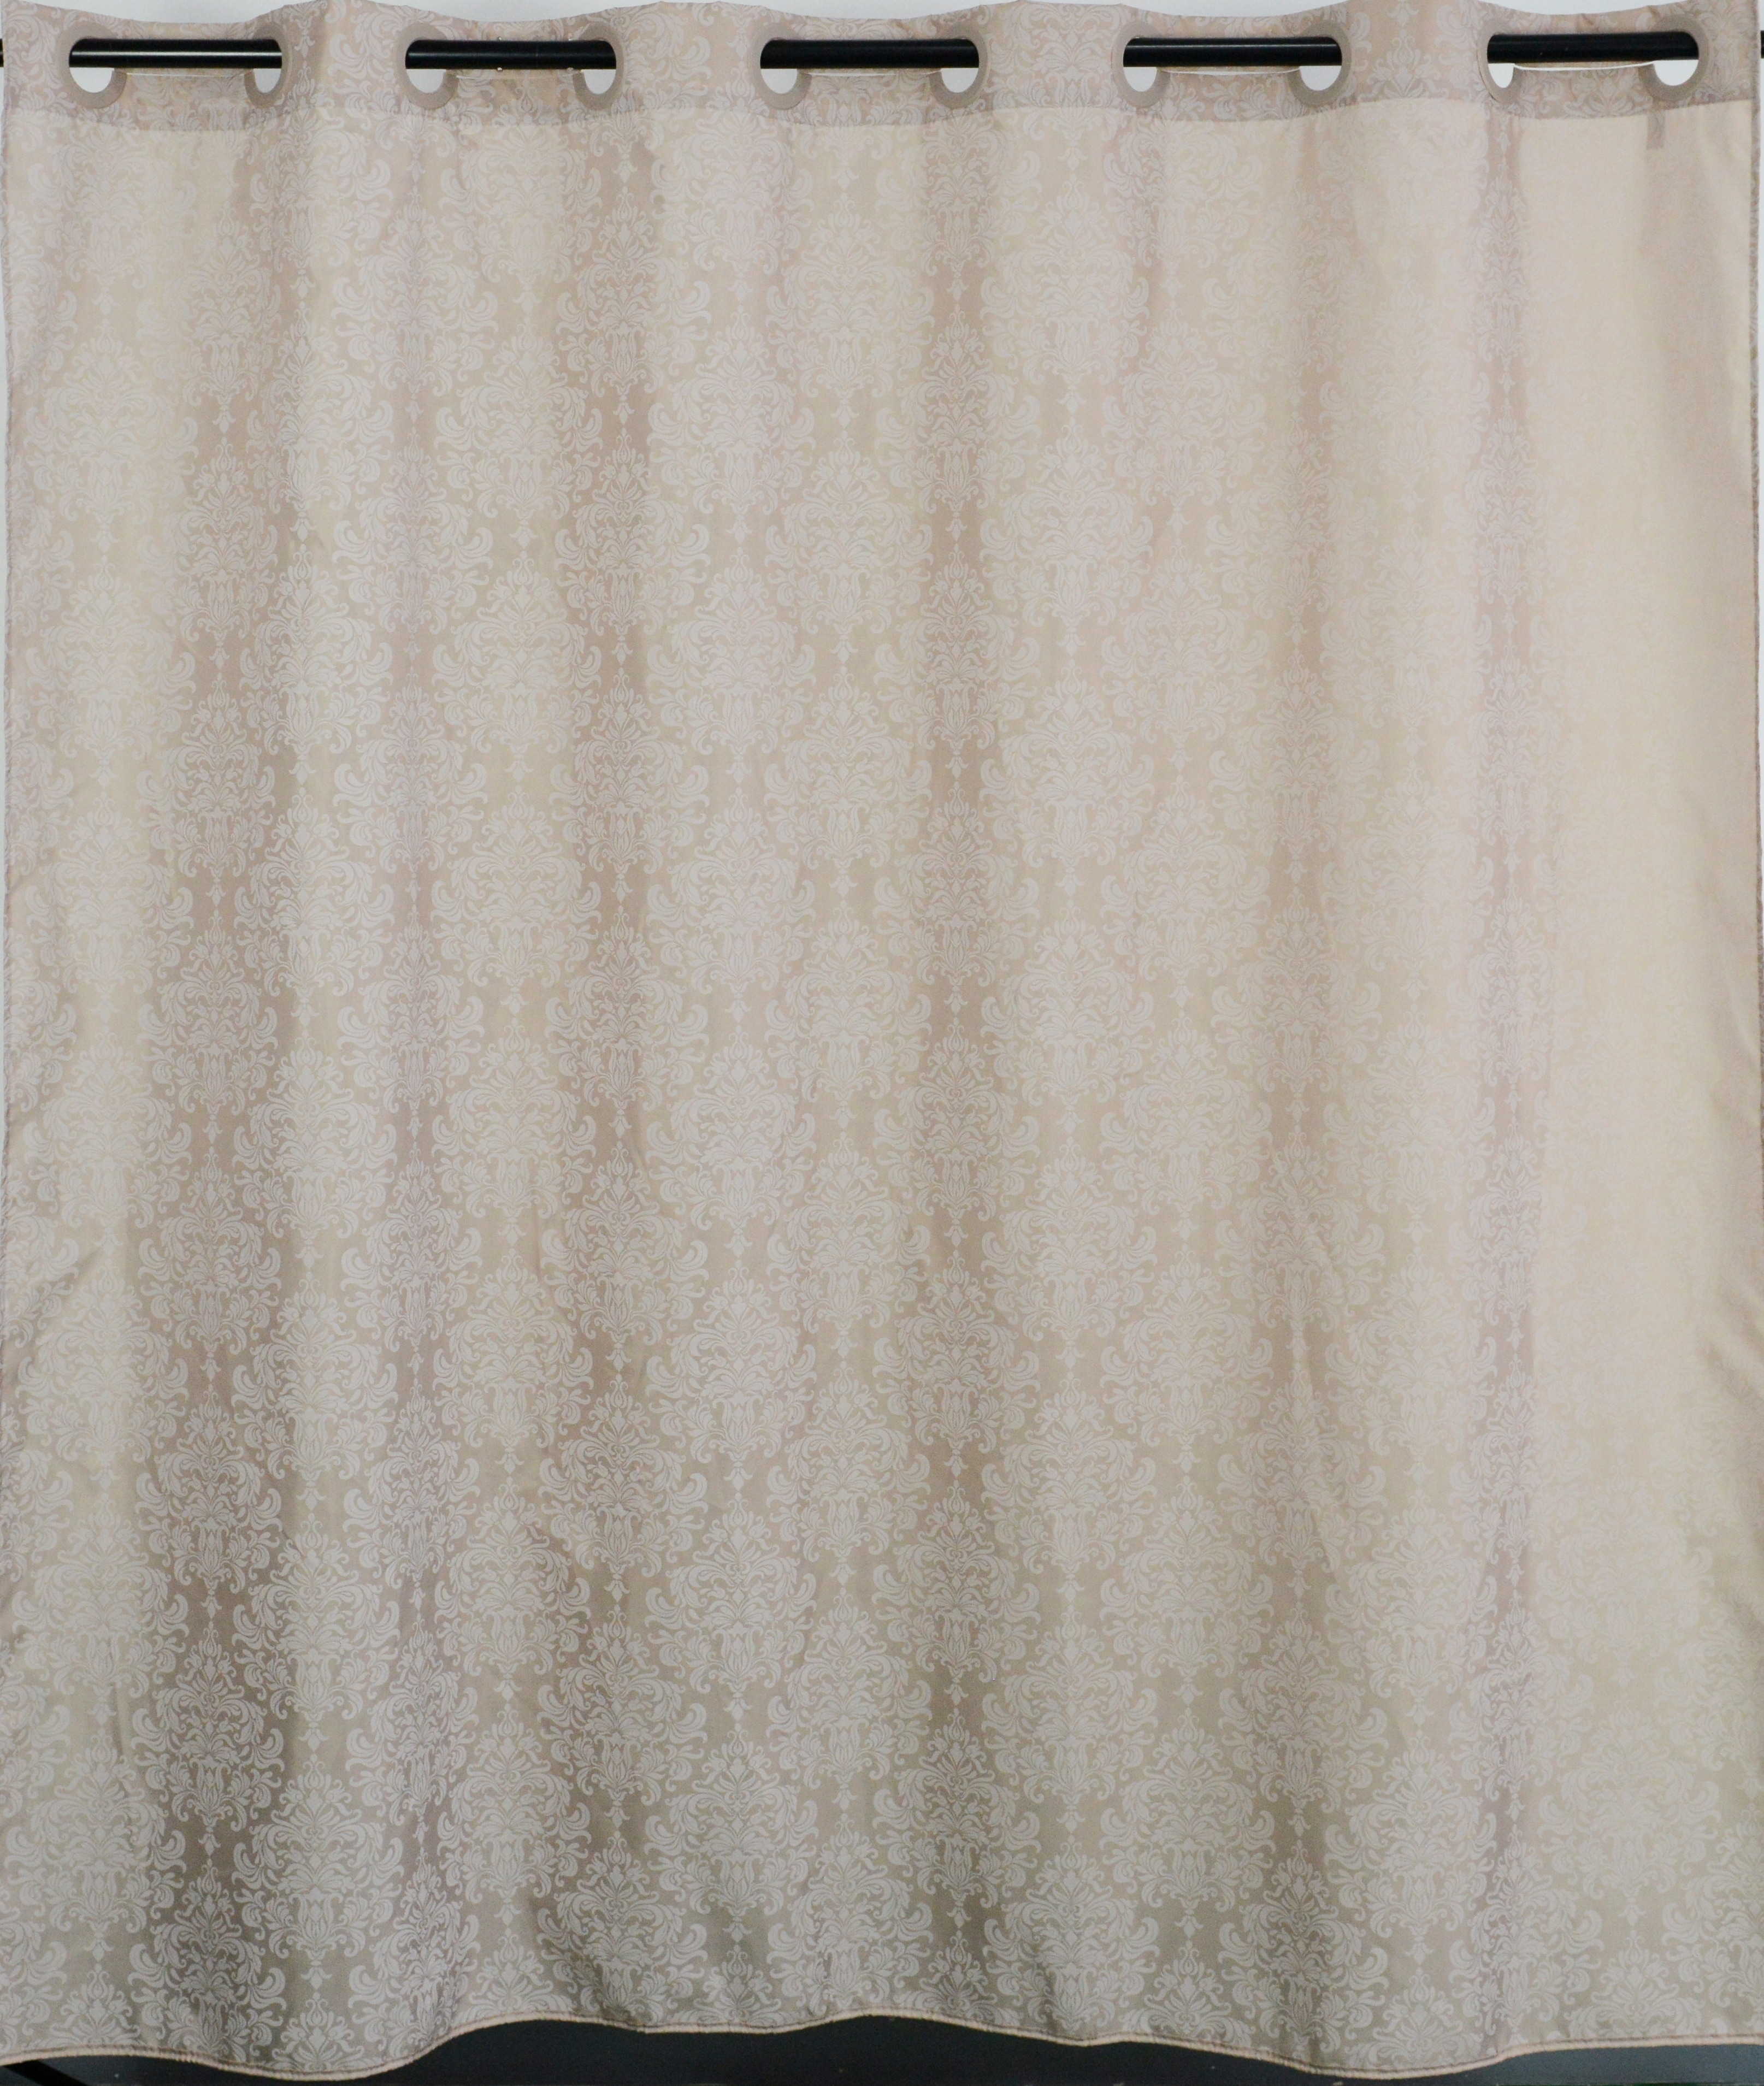 все цены на Штора для ванной My Space Marquise с люверсами, PR180180019, полиэстер, 180 х 180 см онлайн